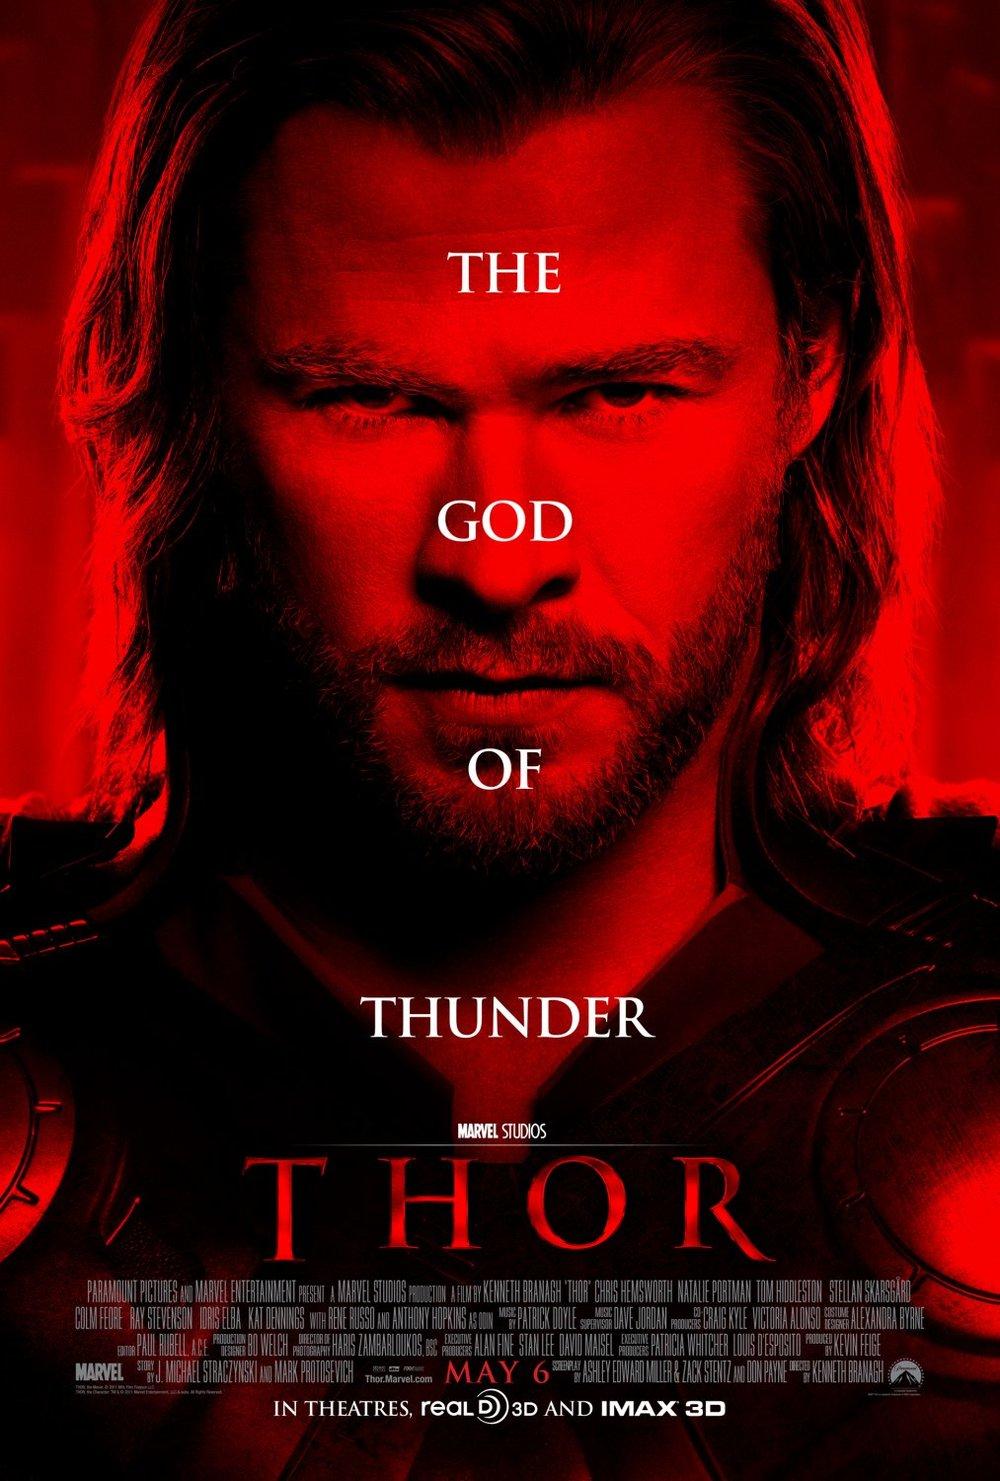 thor-movie-poster.jpg